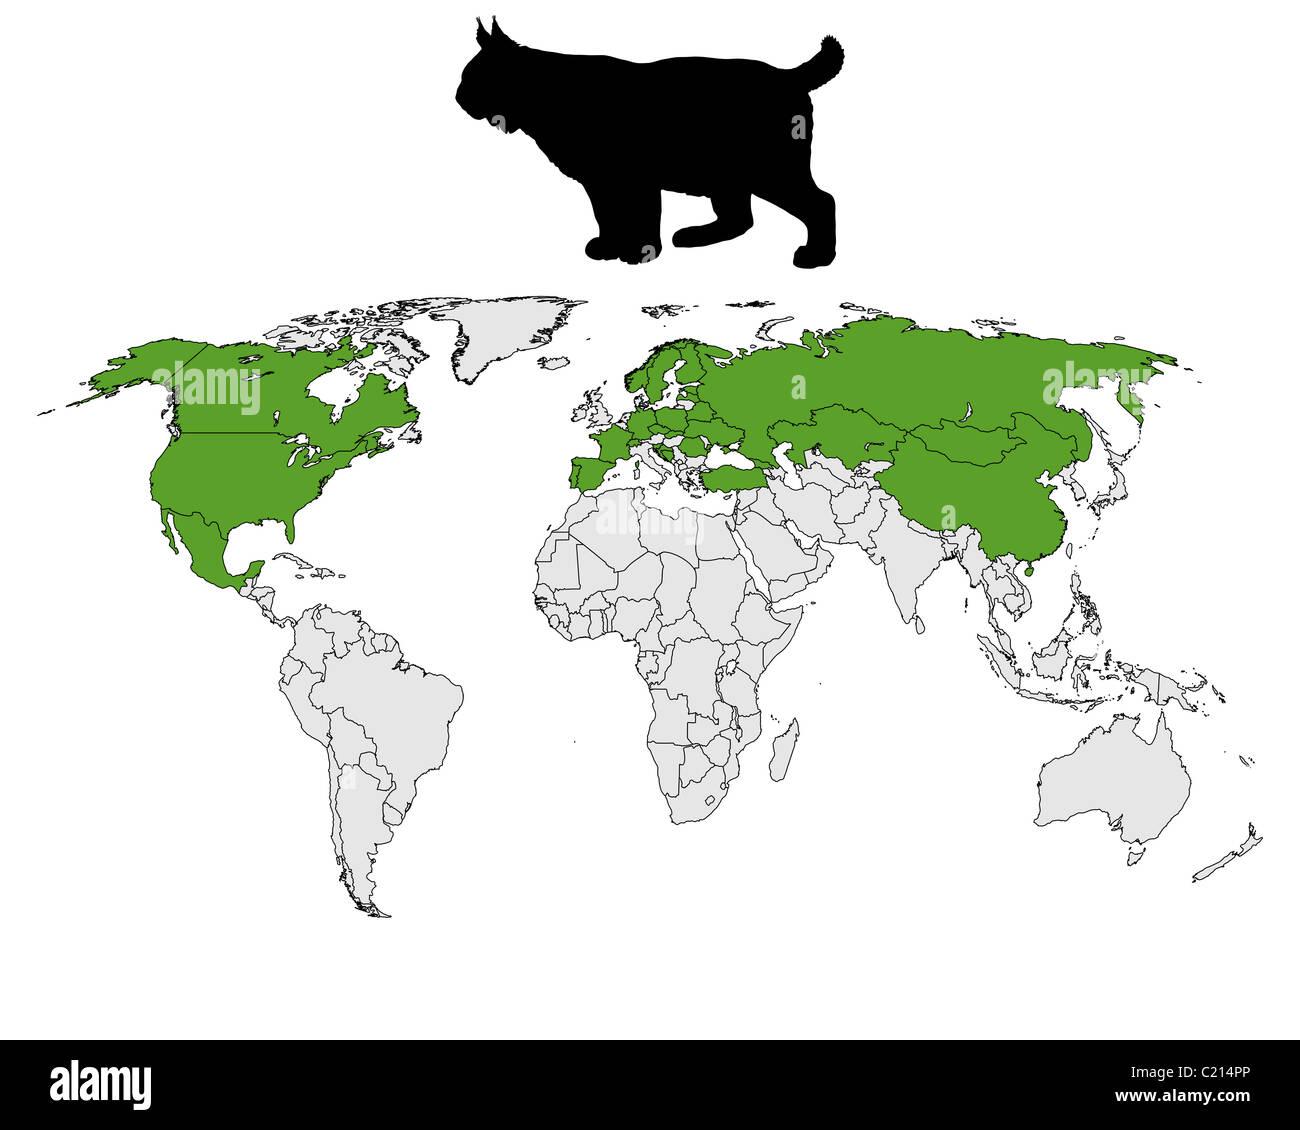 Lynx range map - Stock Image